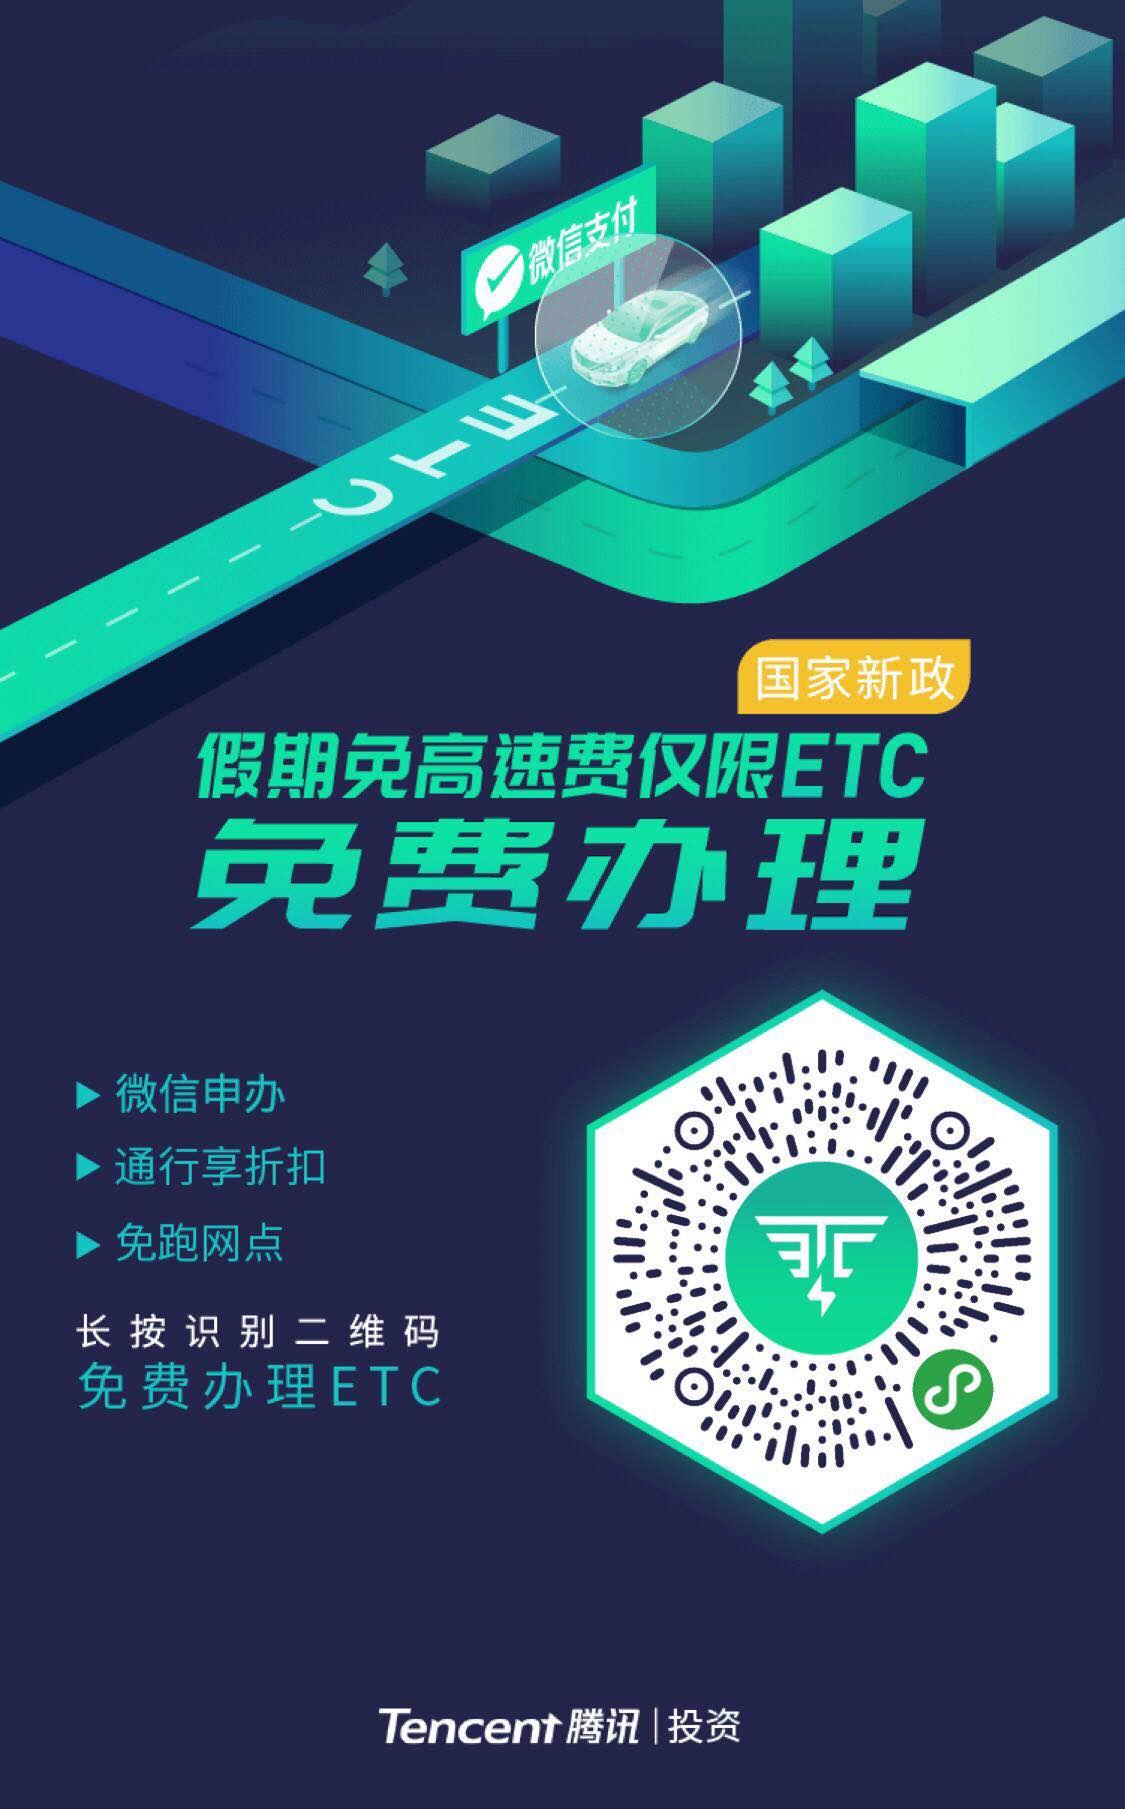 ETC信号弱解决办法?无关机器设备,问题可能出在车上